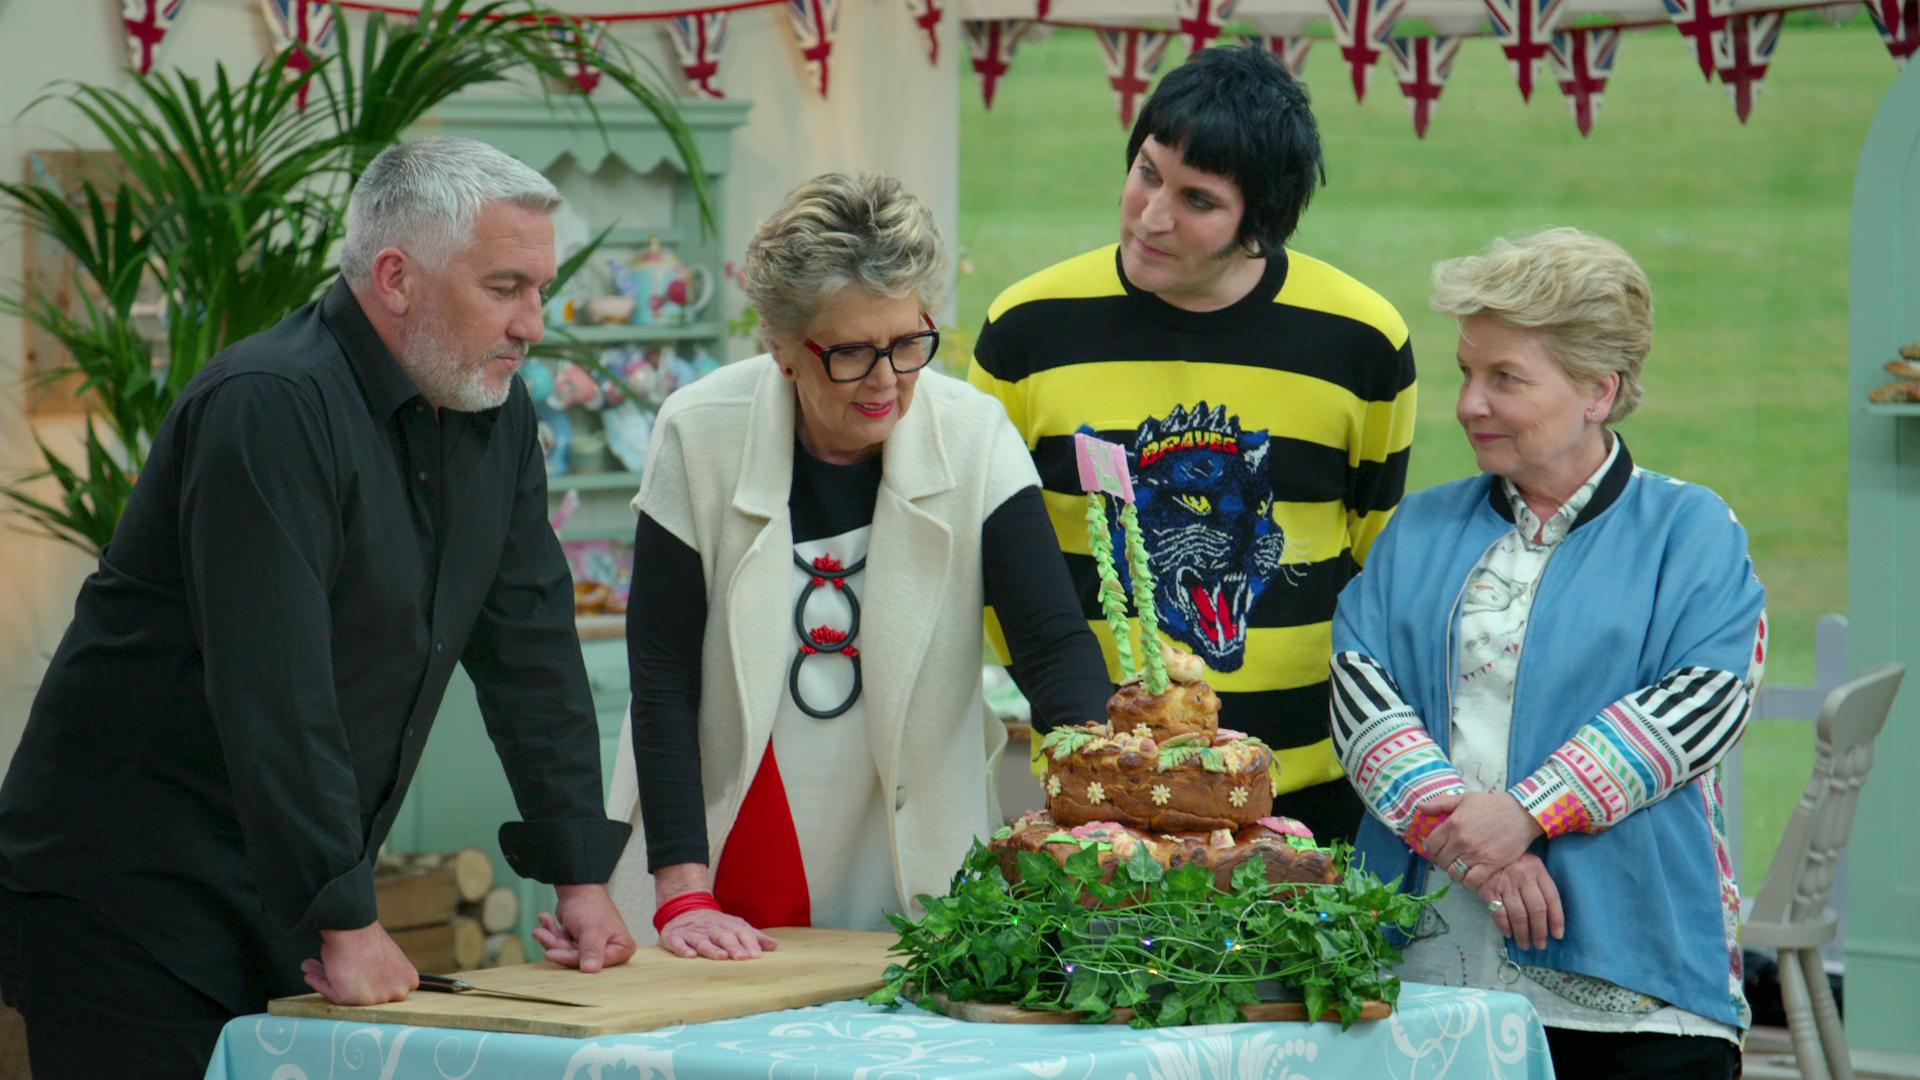 Great British Bake Off's Paul, Prue, Noel, and Sandi examine a festive bread cake creation.